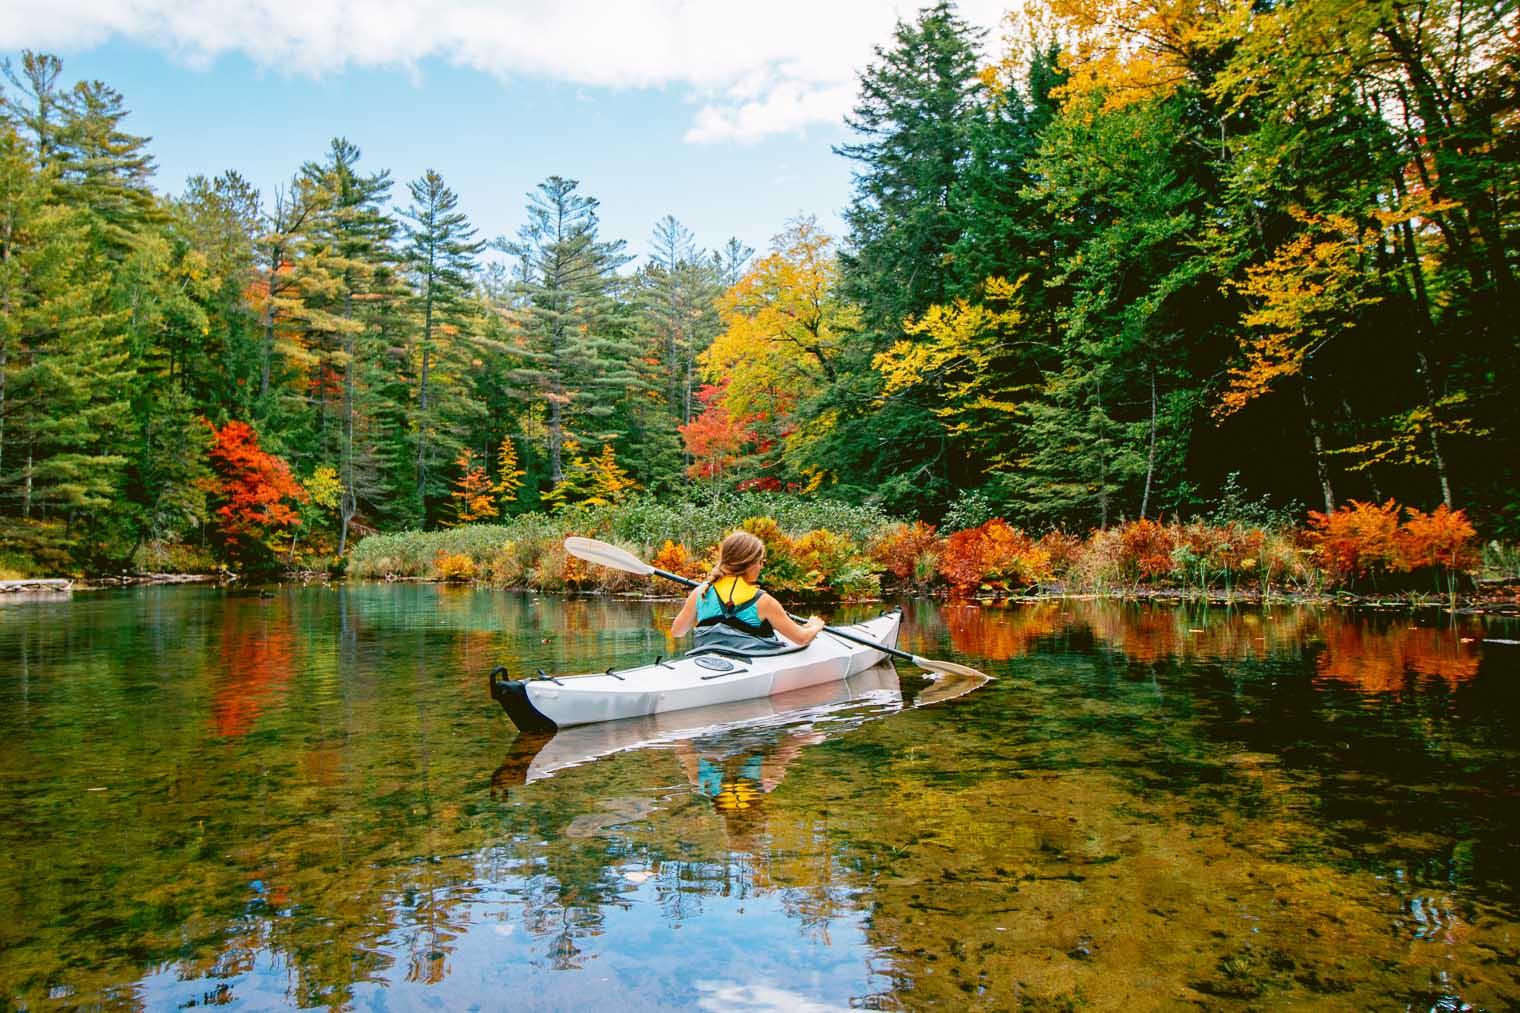 Autumn kayak camping in the Adirondacks.